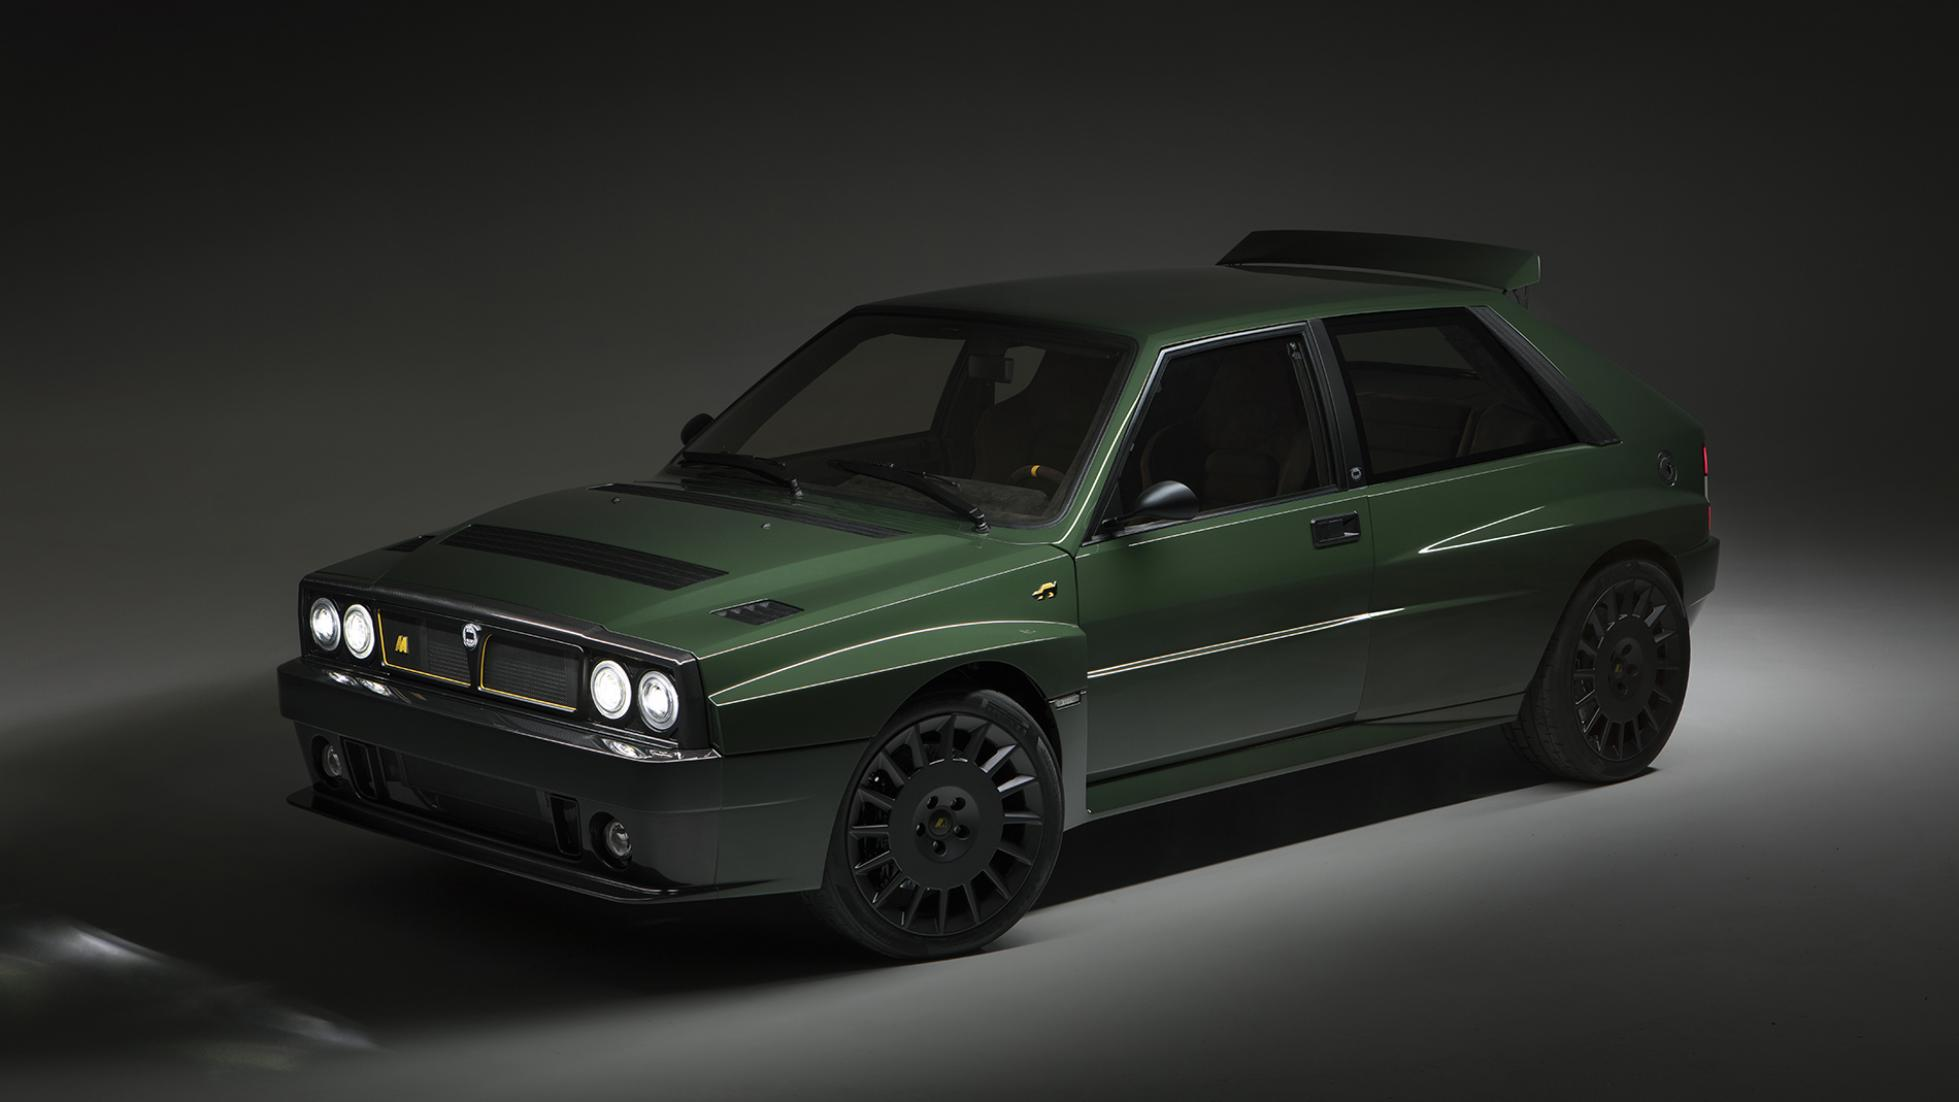 2018 Automobili Amos Lancia Delta Futurista